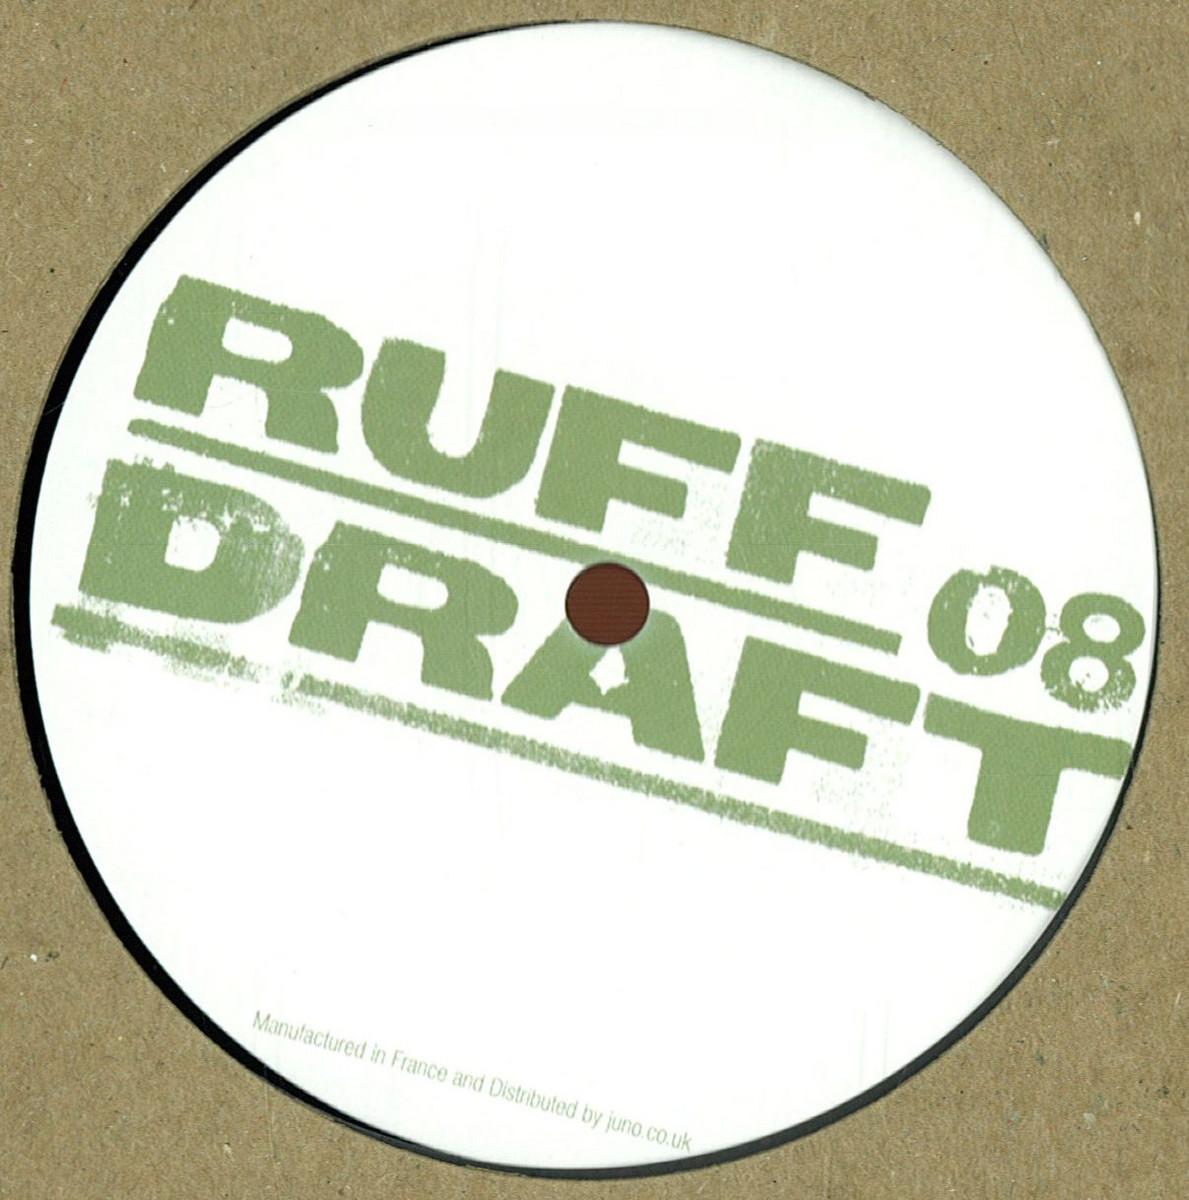 Cottam Ruff Draft 08 Ruff Draft Ruffdraft08 Vinyl